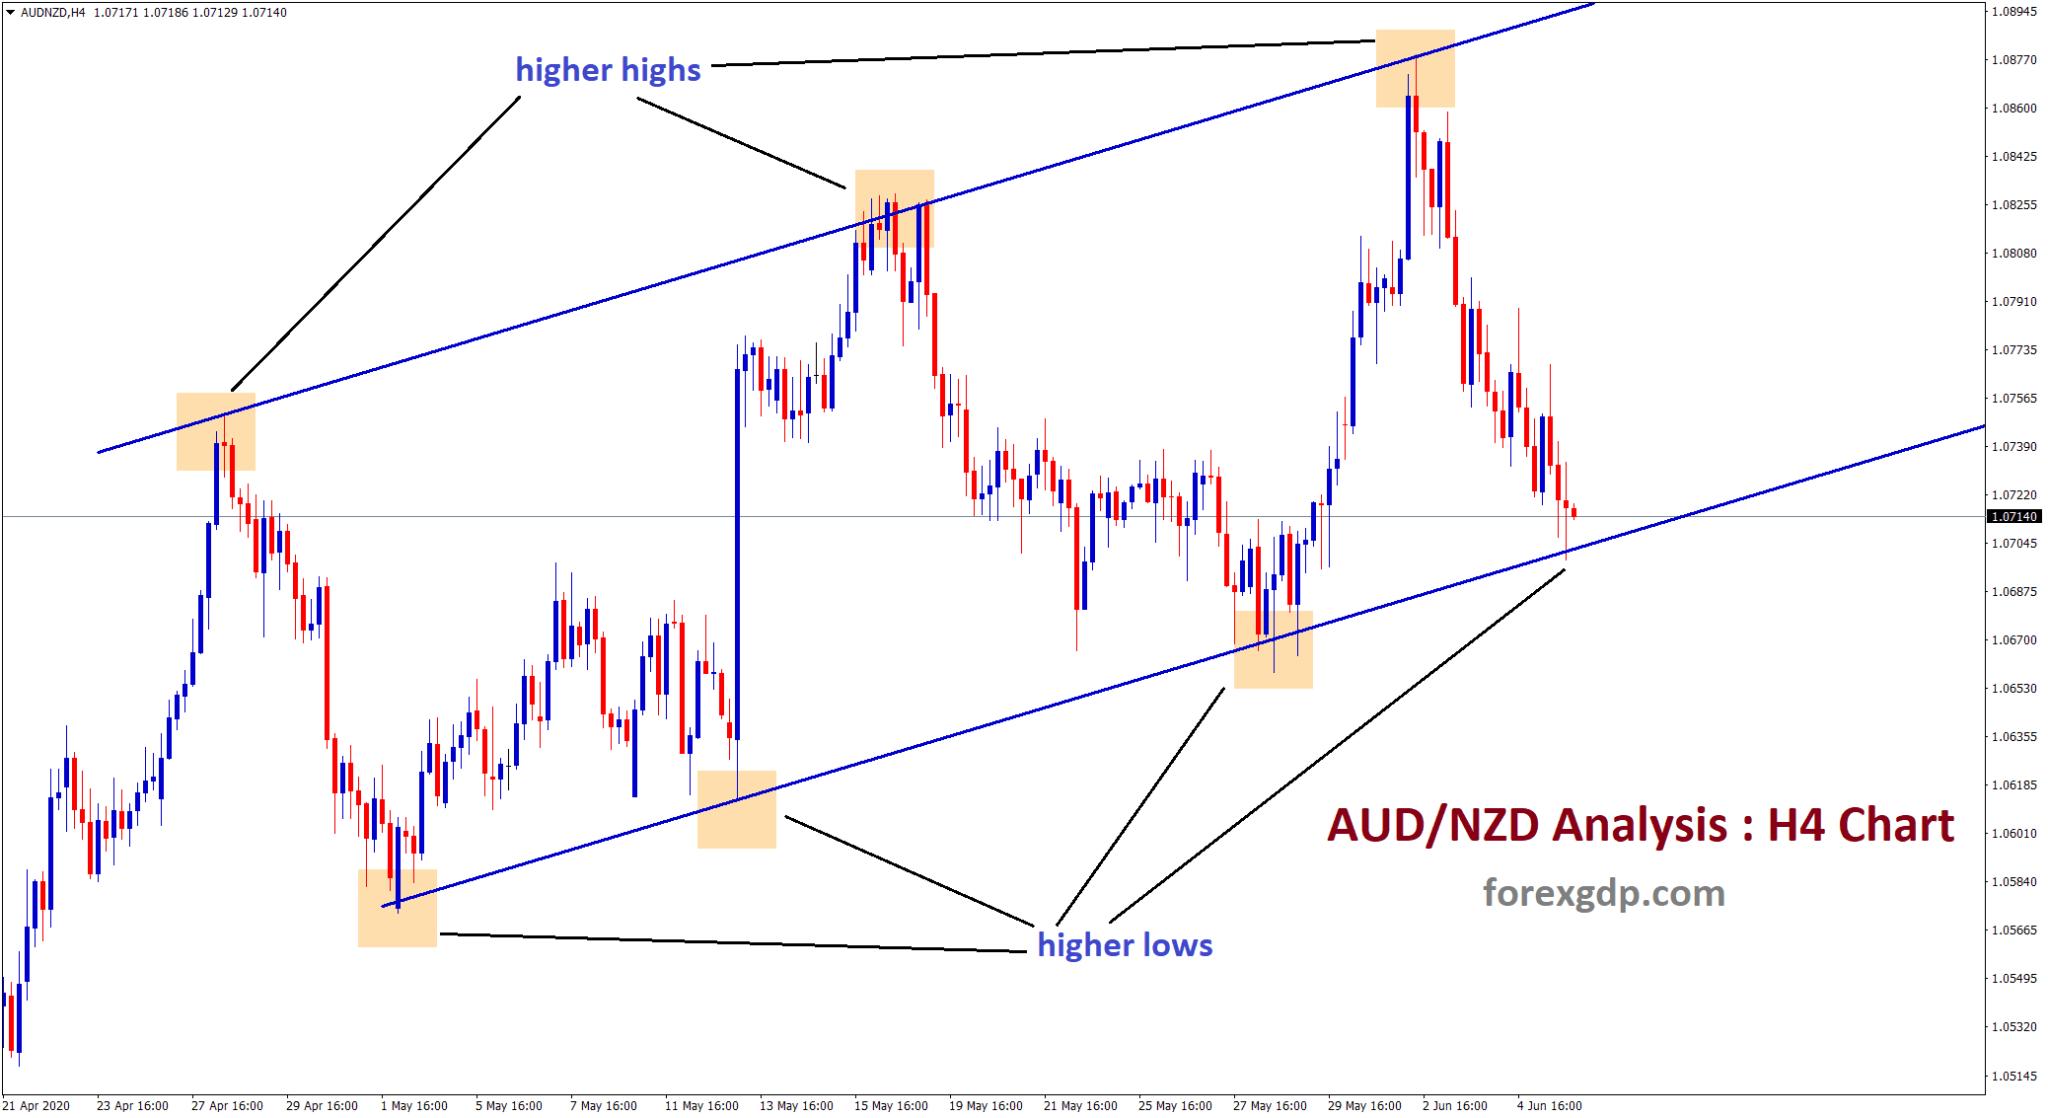 AUDNZD higher highs higher lows formed in h4 timeframe